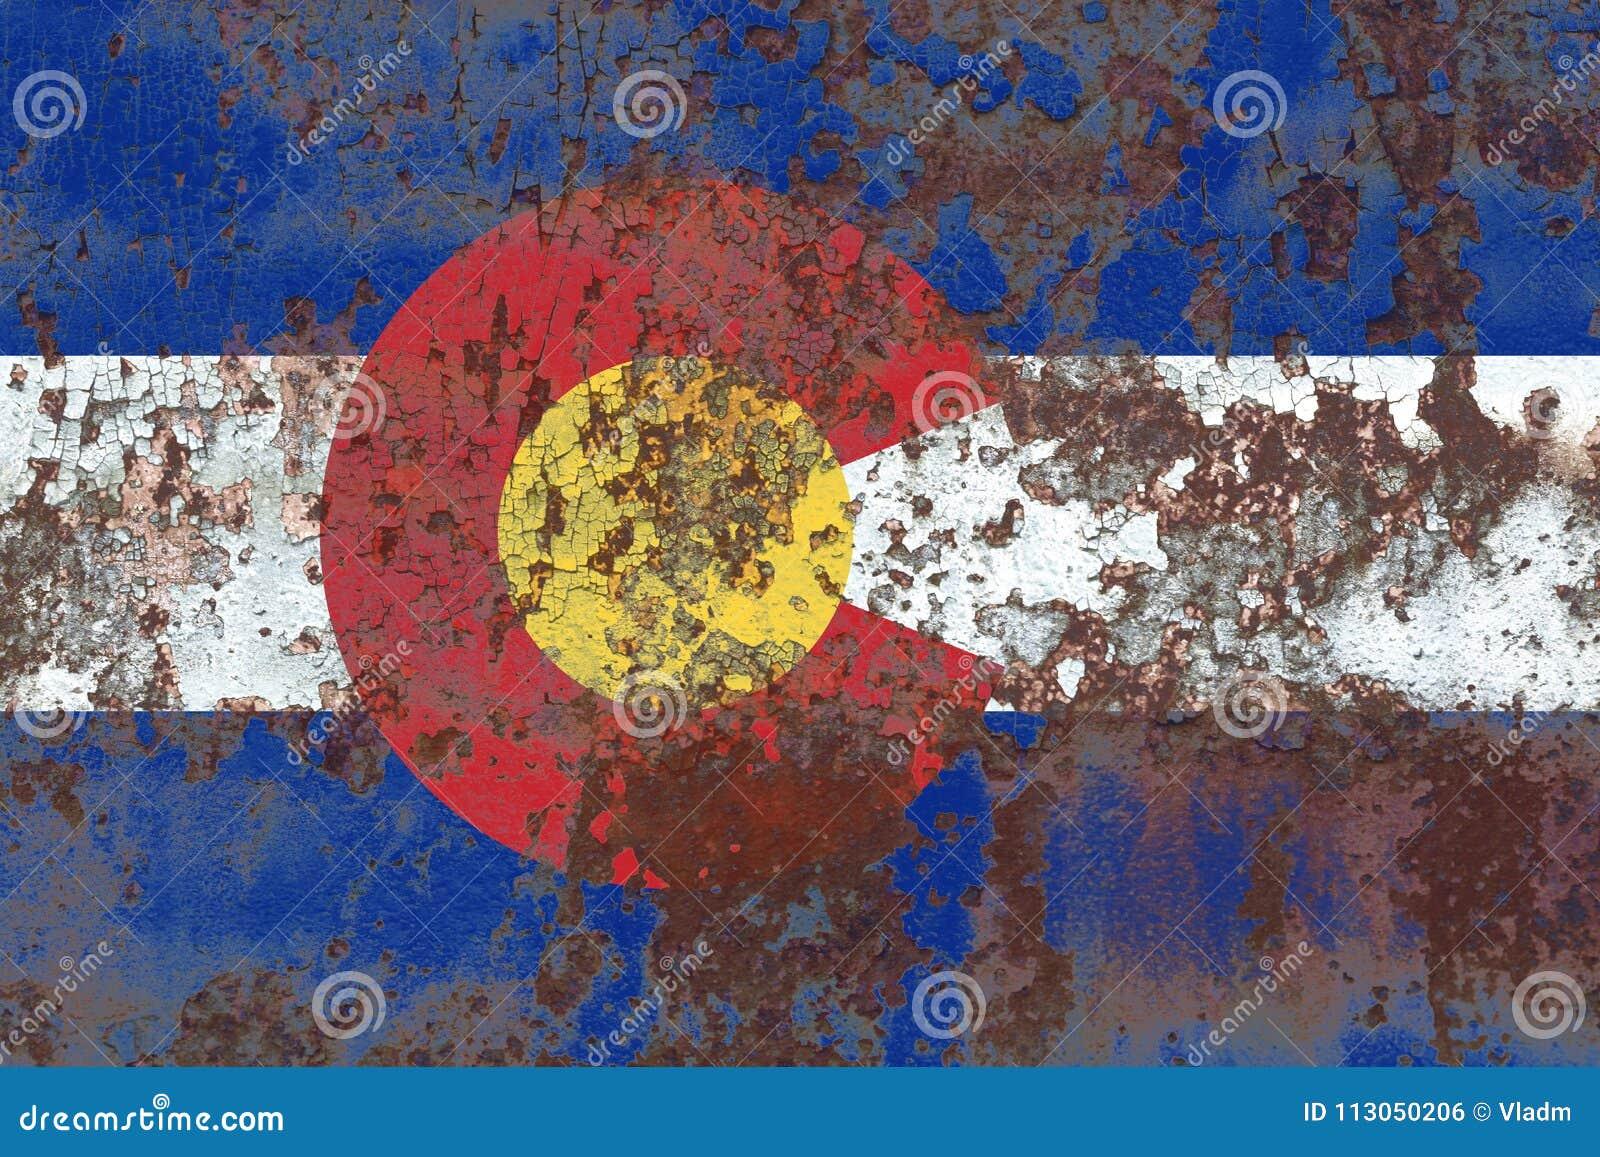 Colorado state grunge flag, United States of America